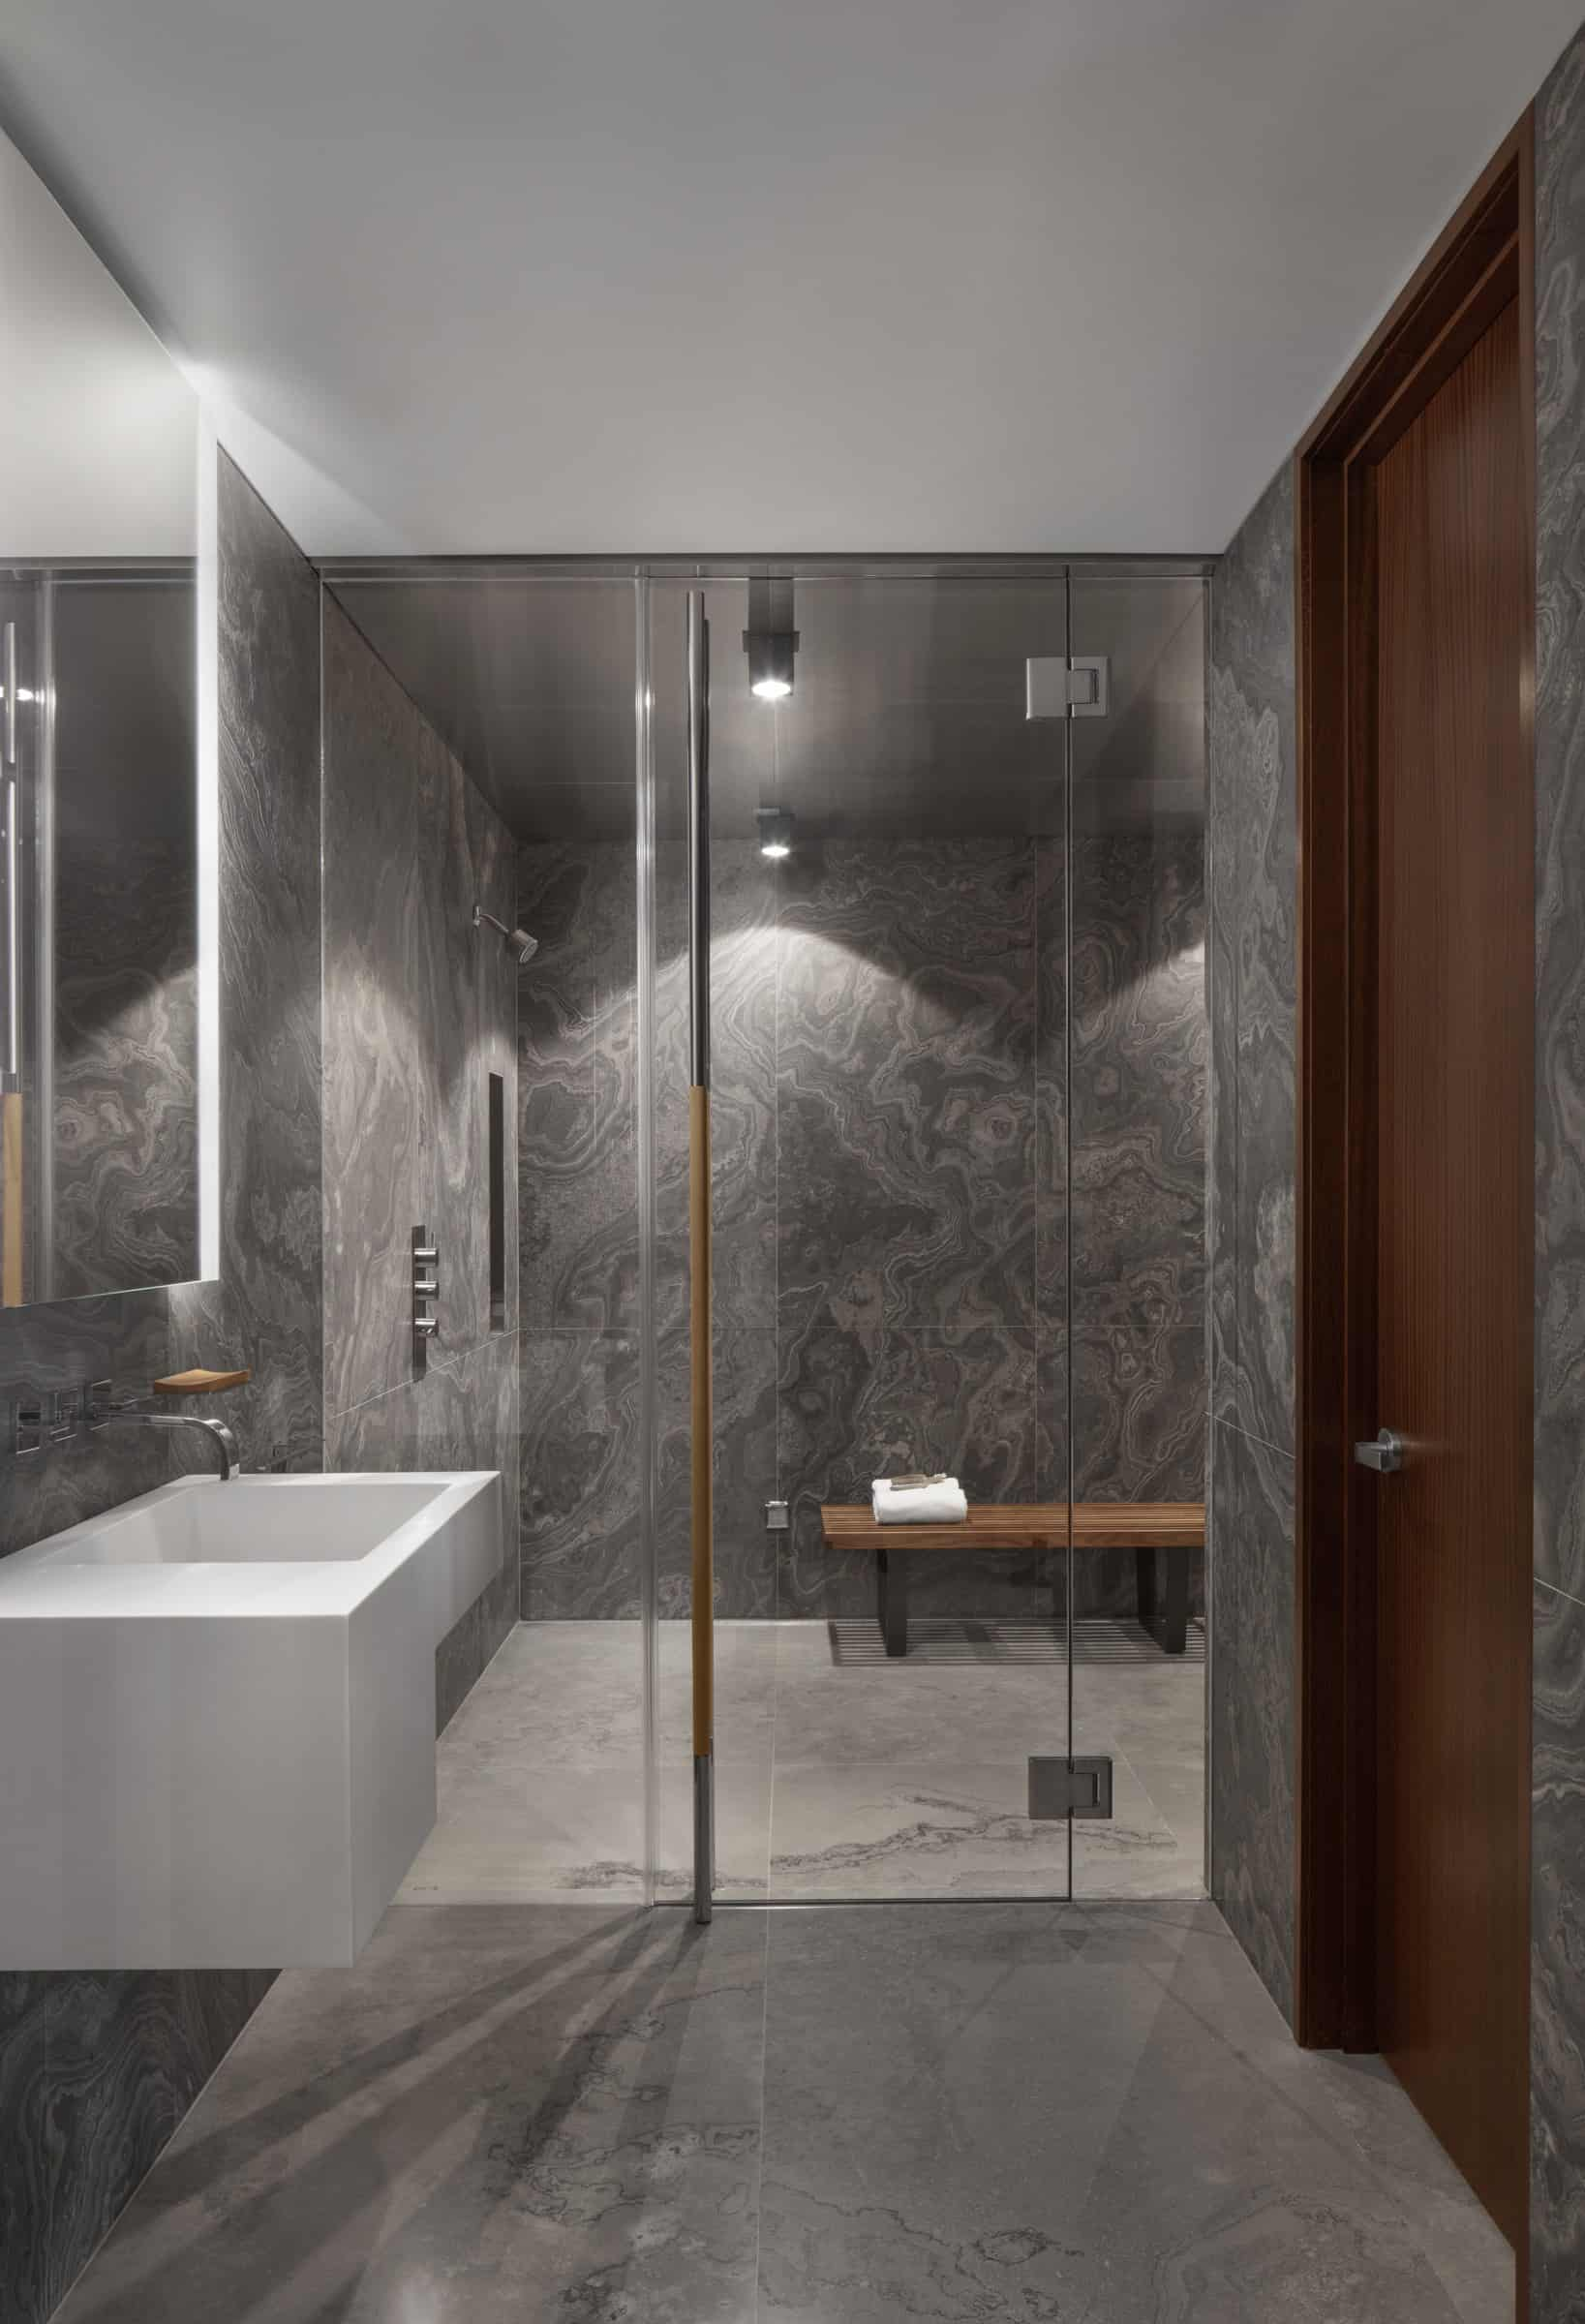 Studio Munge_Private Residence_30_Adrien Williams_web